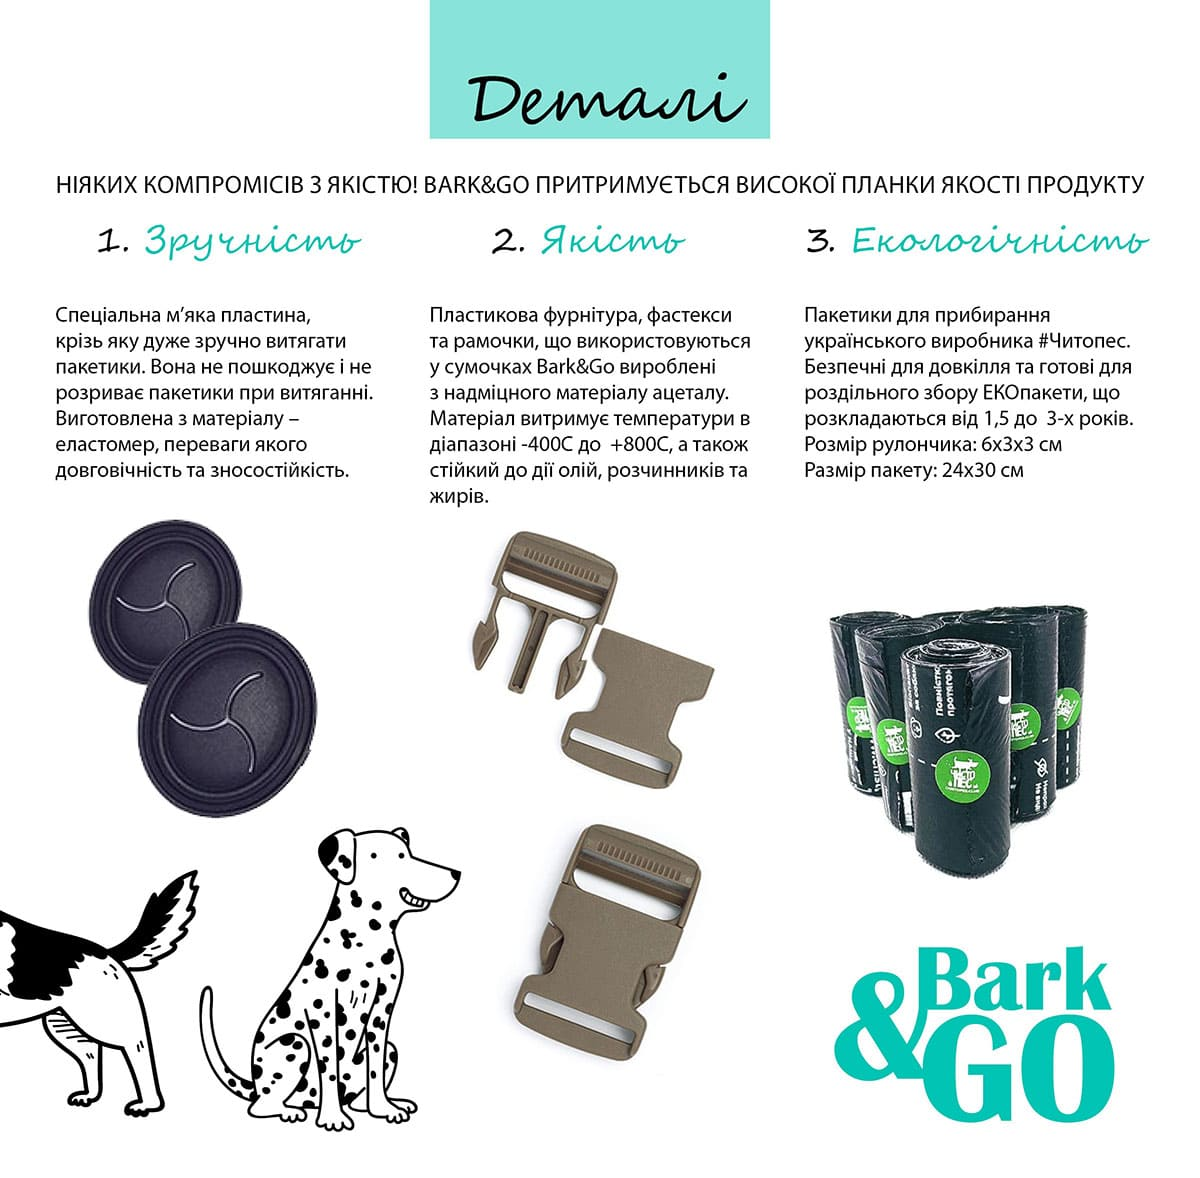 bark-03